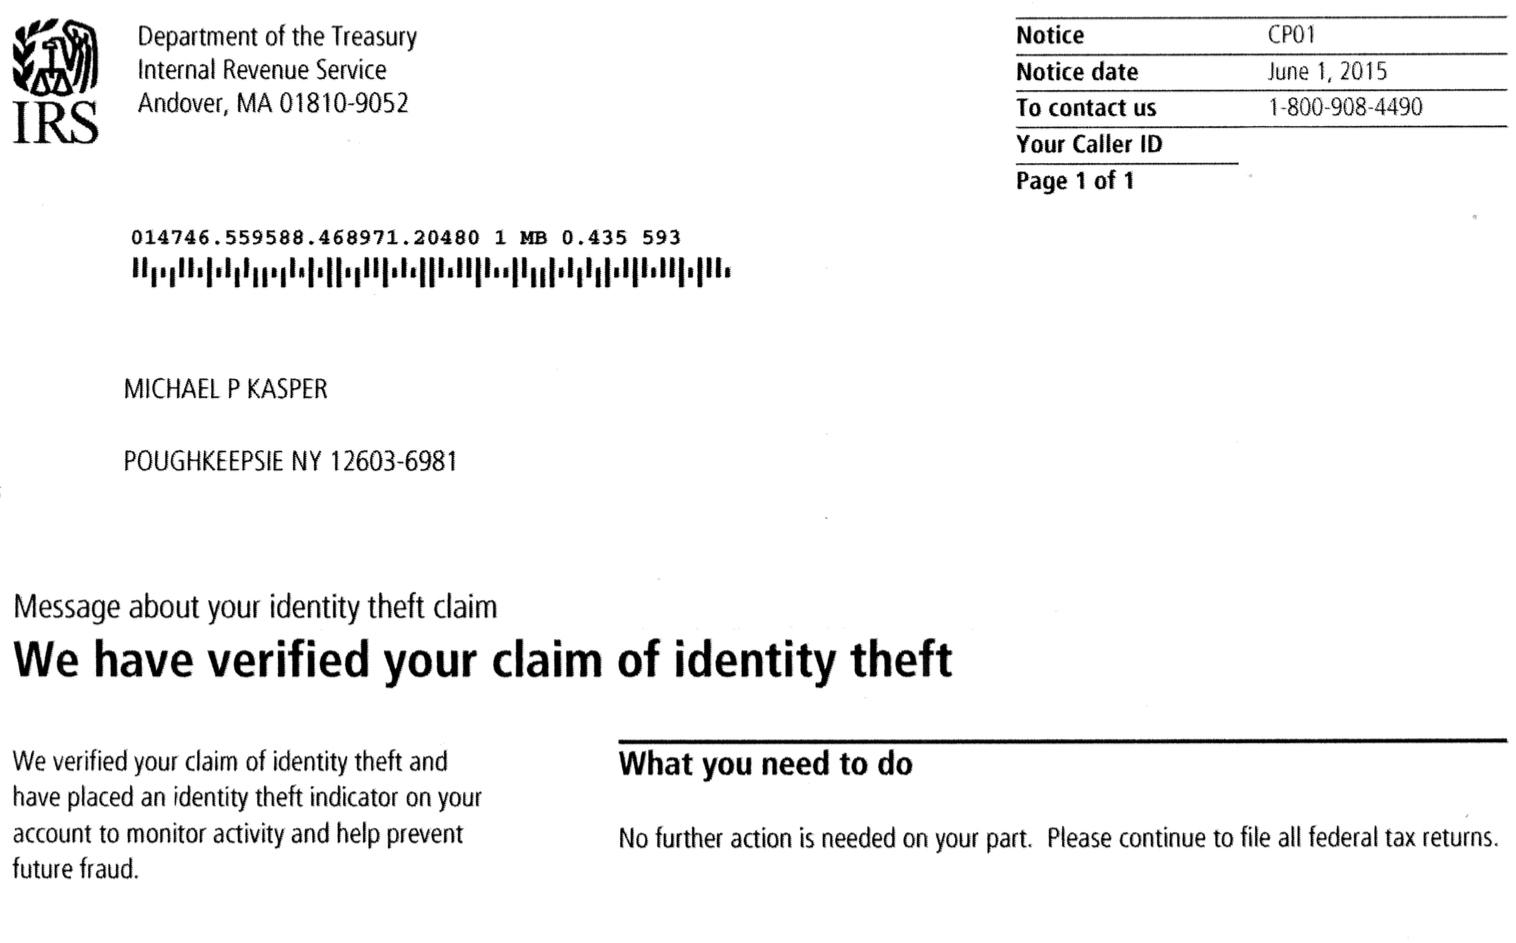 A rare detailed look inside the IRS's massive data breach, via a